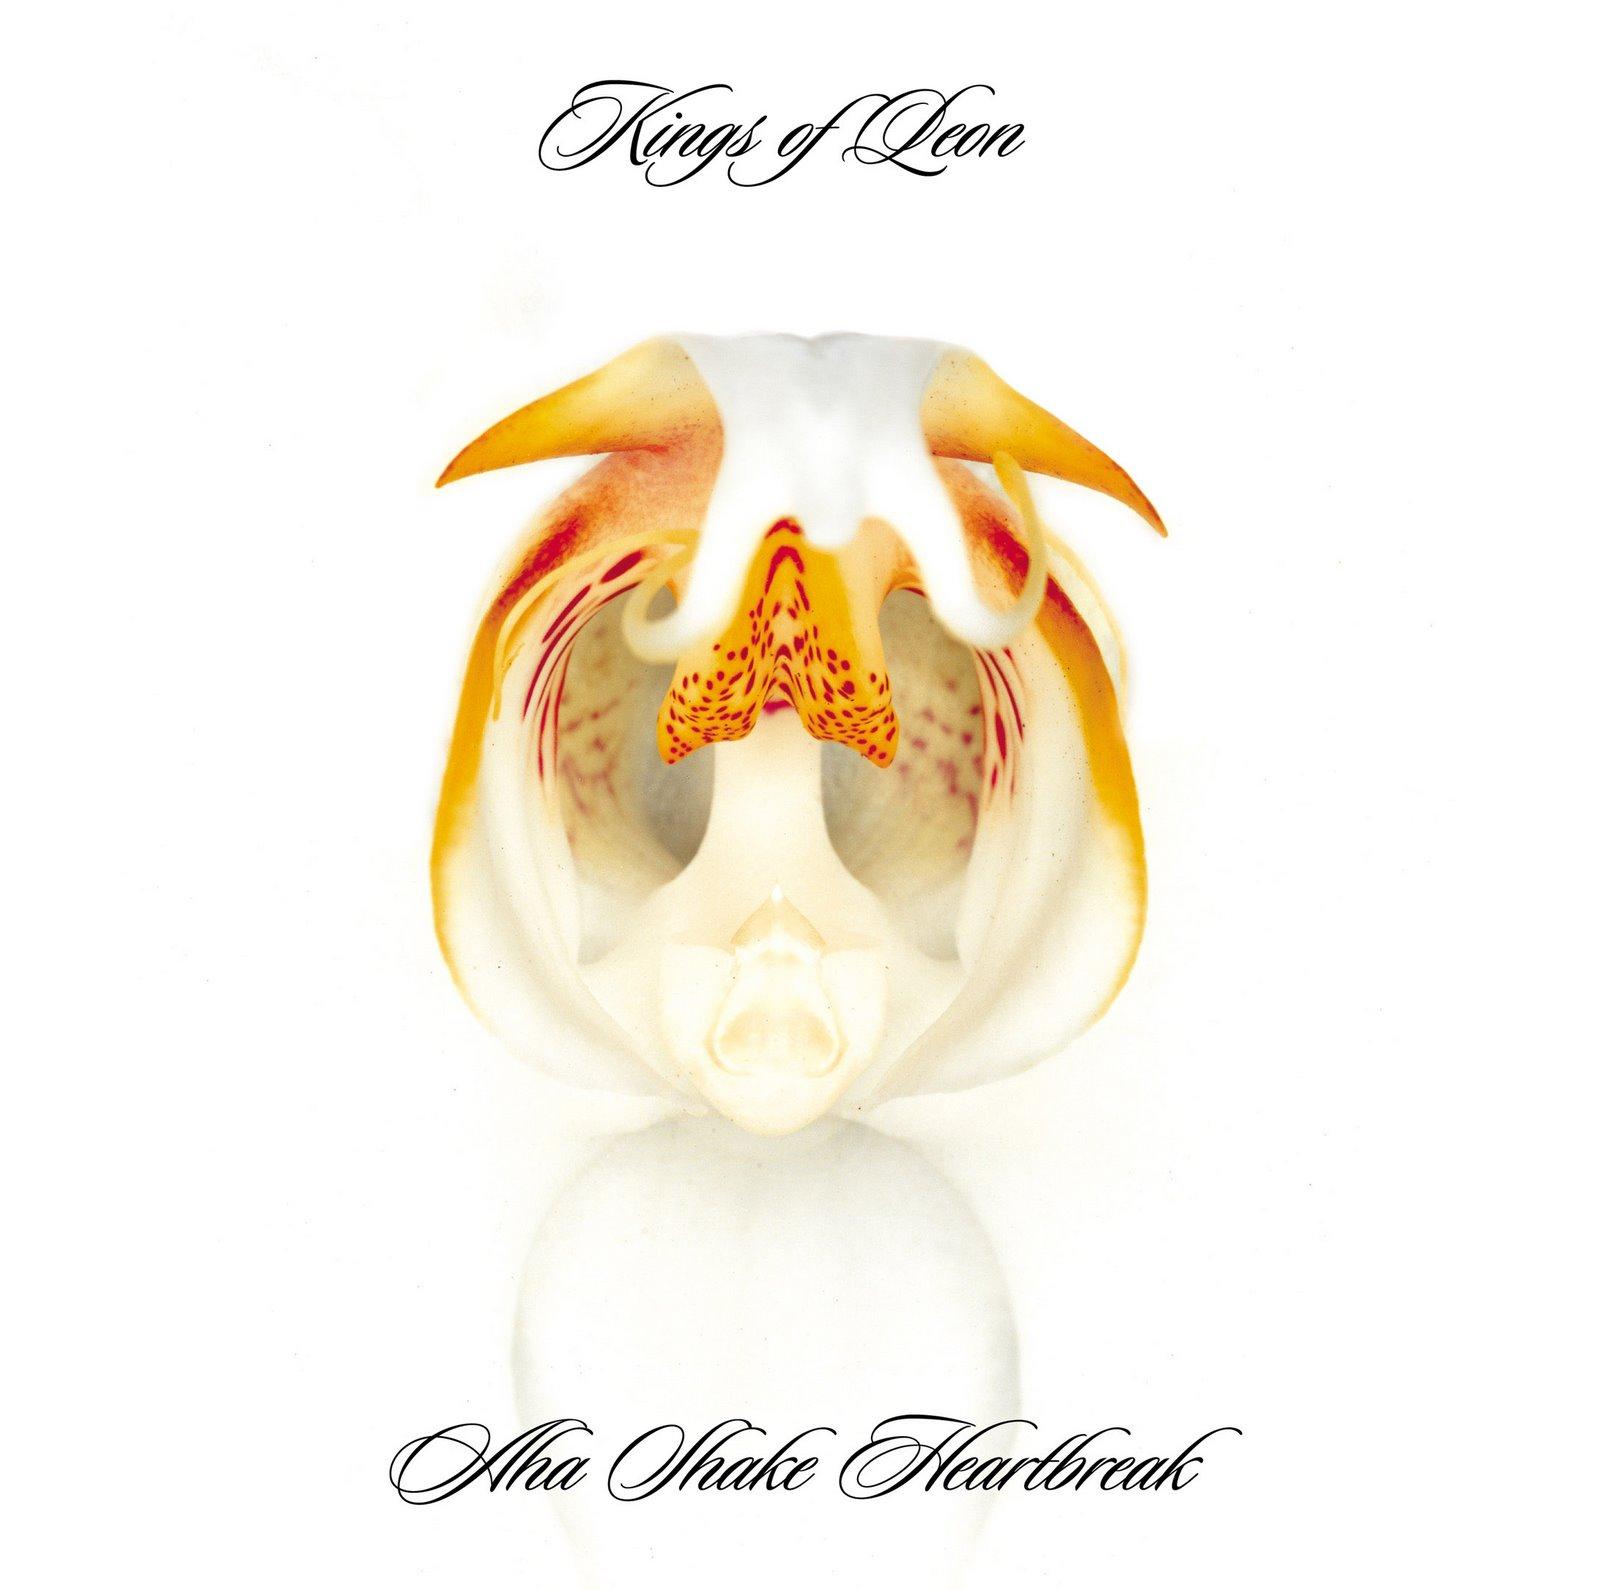 Zeta Flight: Kings of Leon - Aha Shake Heartbreak